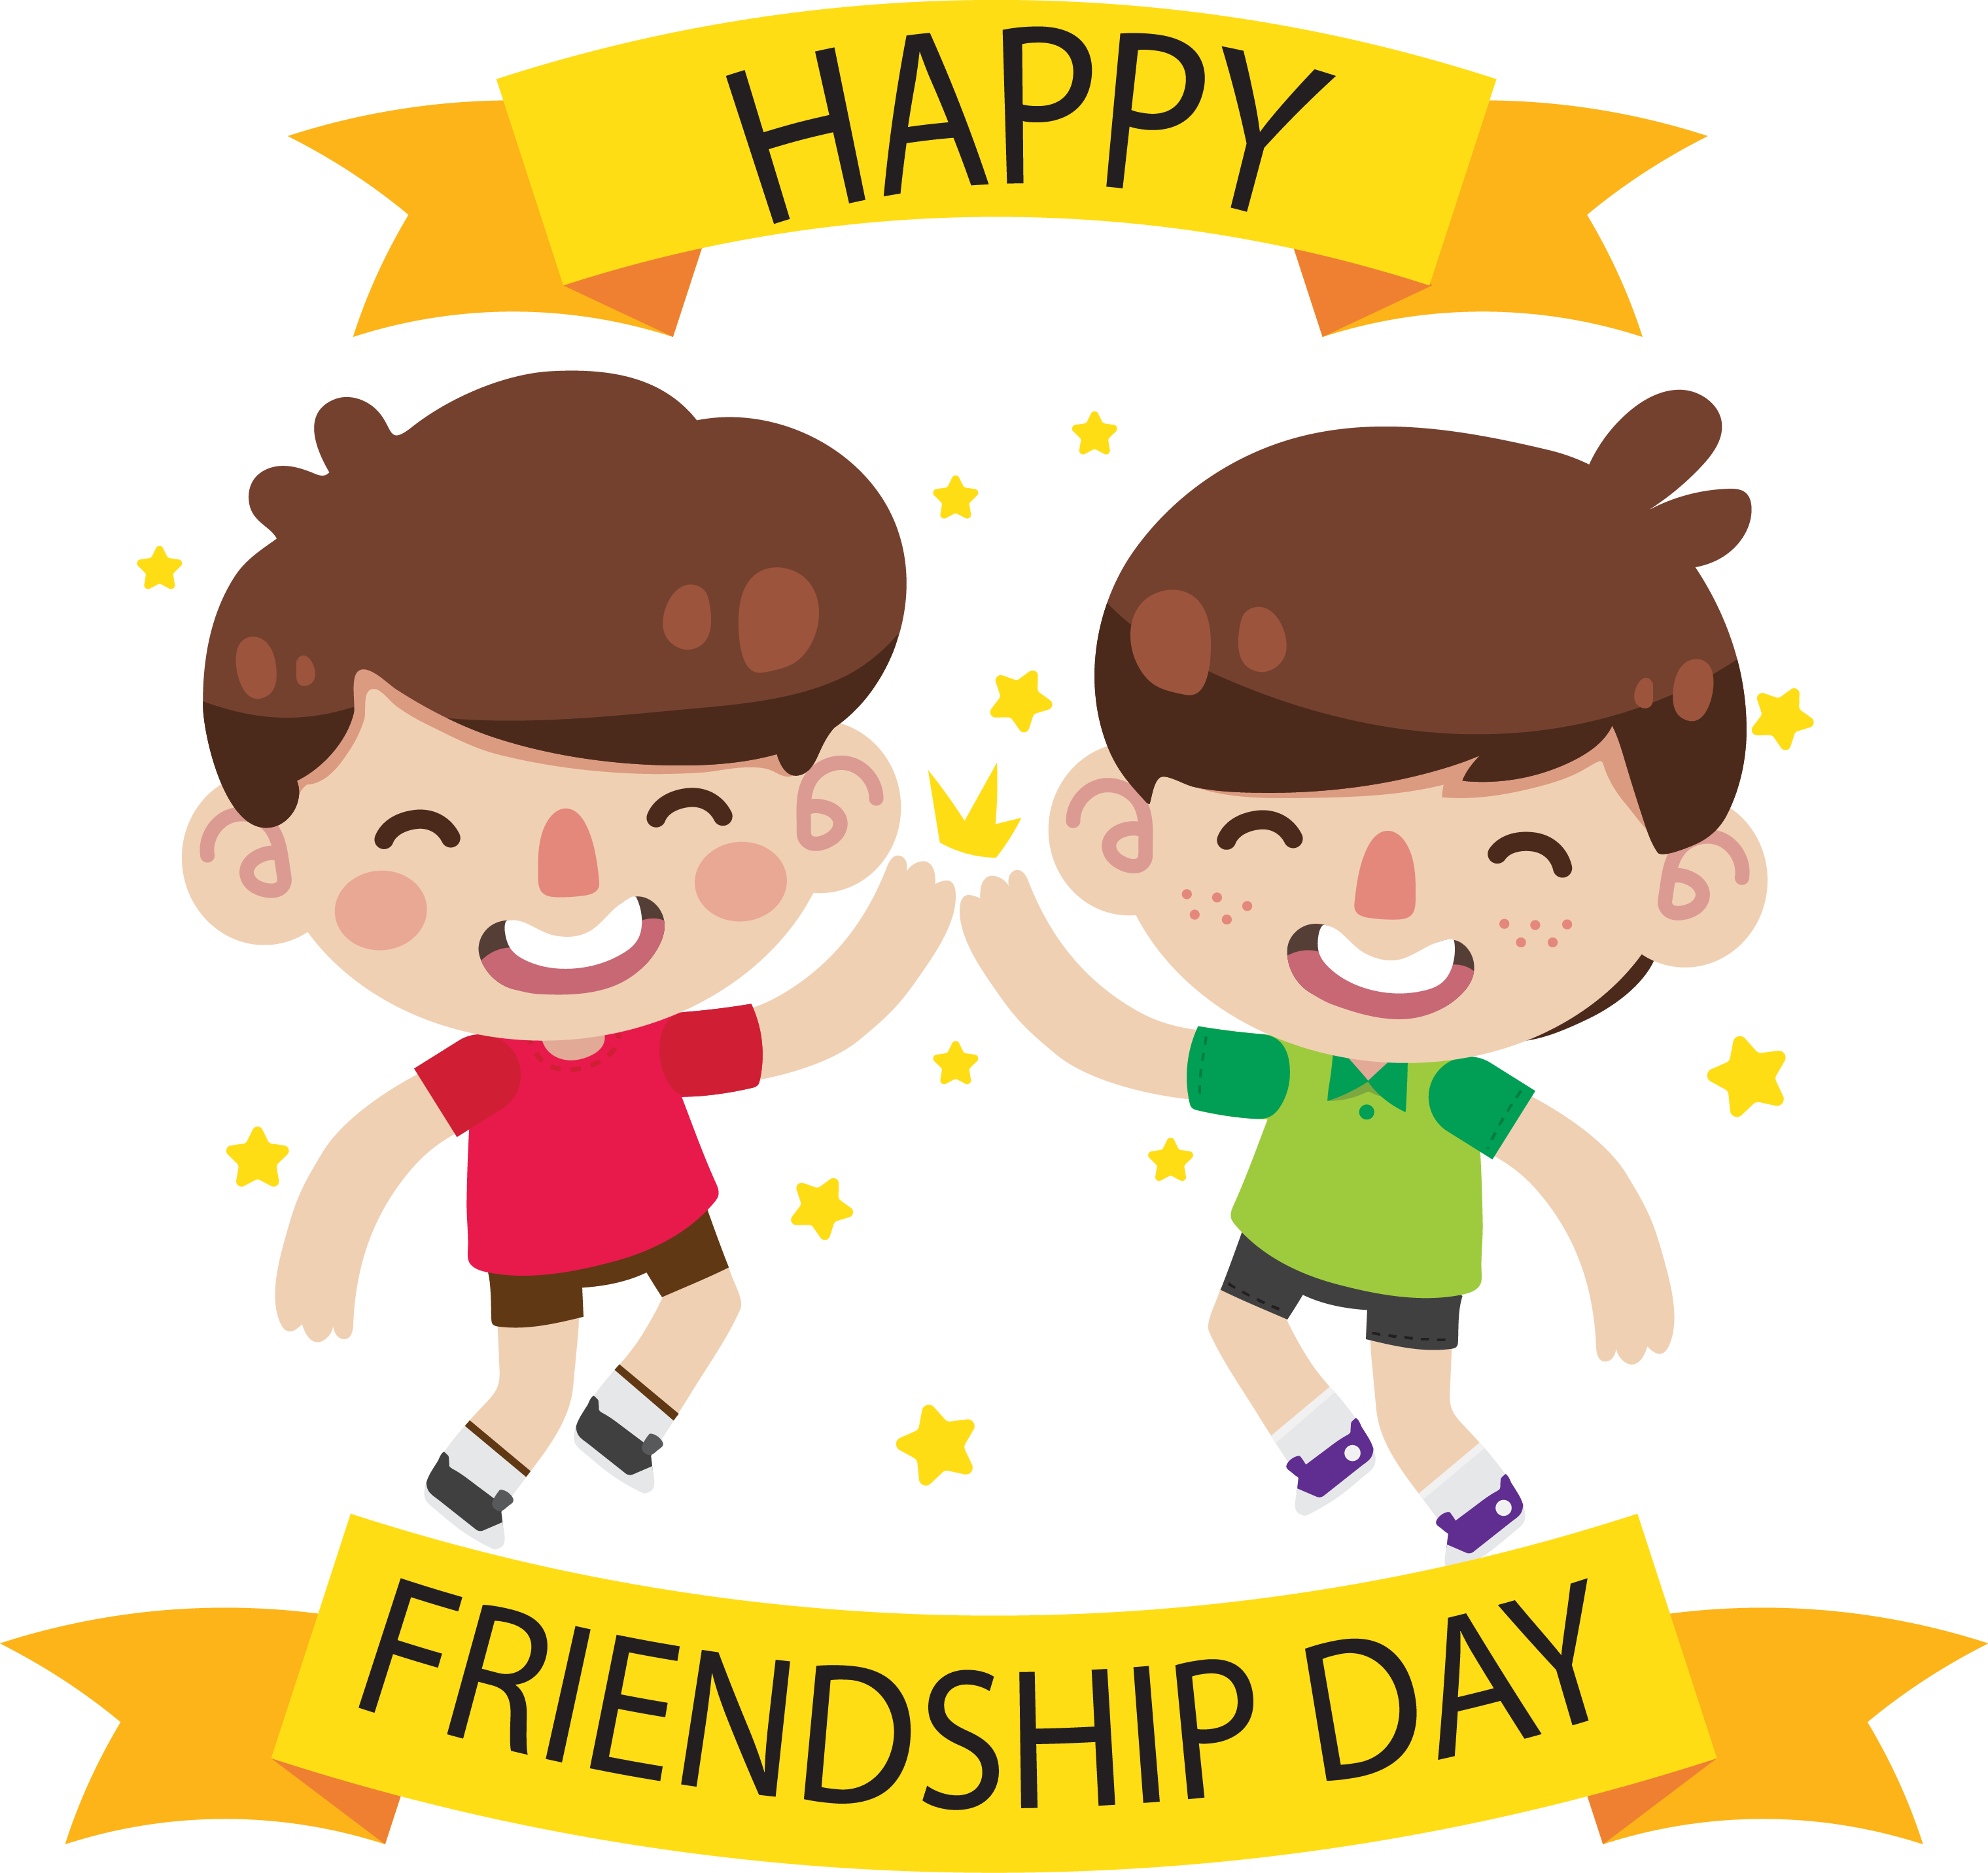 Clipart images of symbols kids of friendships jpg freeuse Free PNG Happy Friendship Day | Konfest jpg freeuse